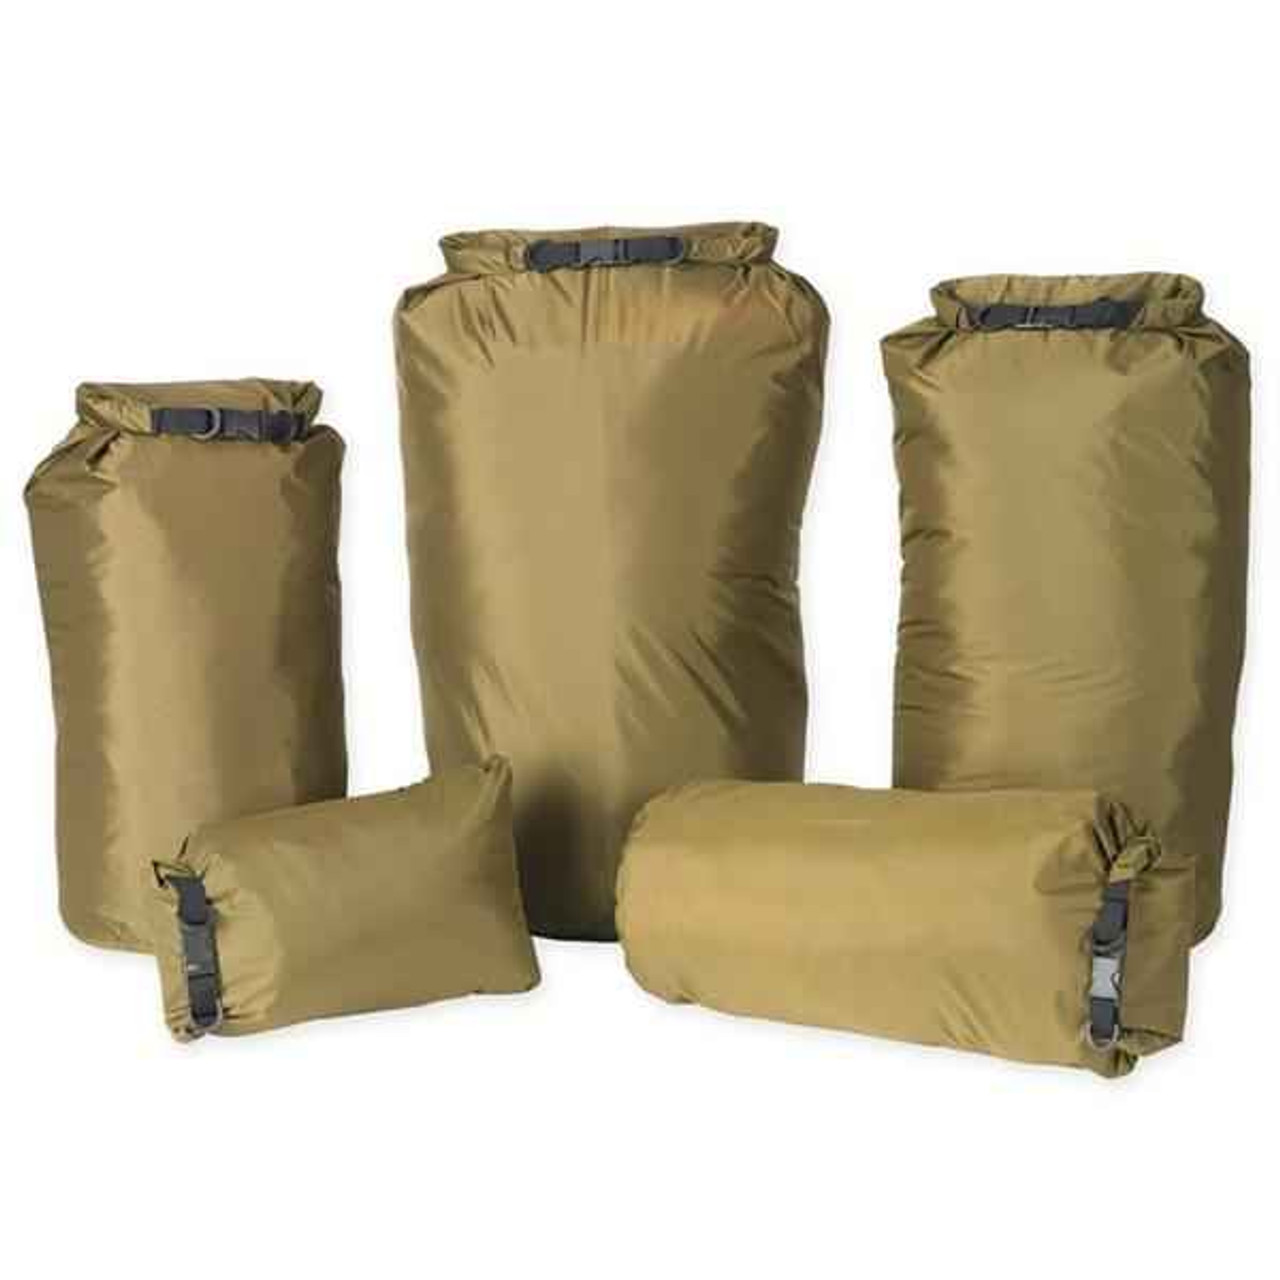 Pro Force Dri-Sak Waterproof Bag - Small, Coyote